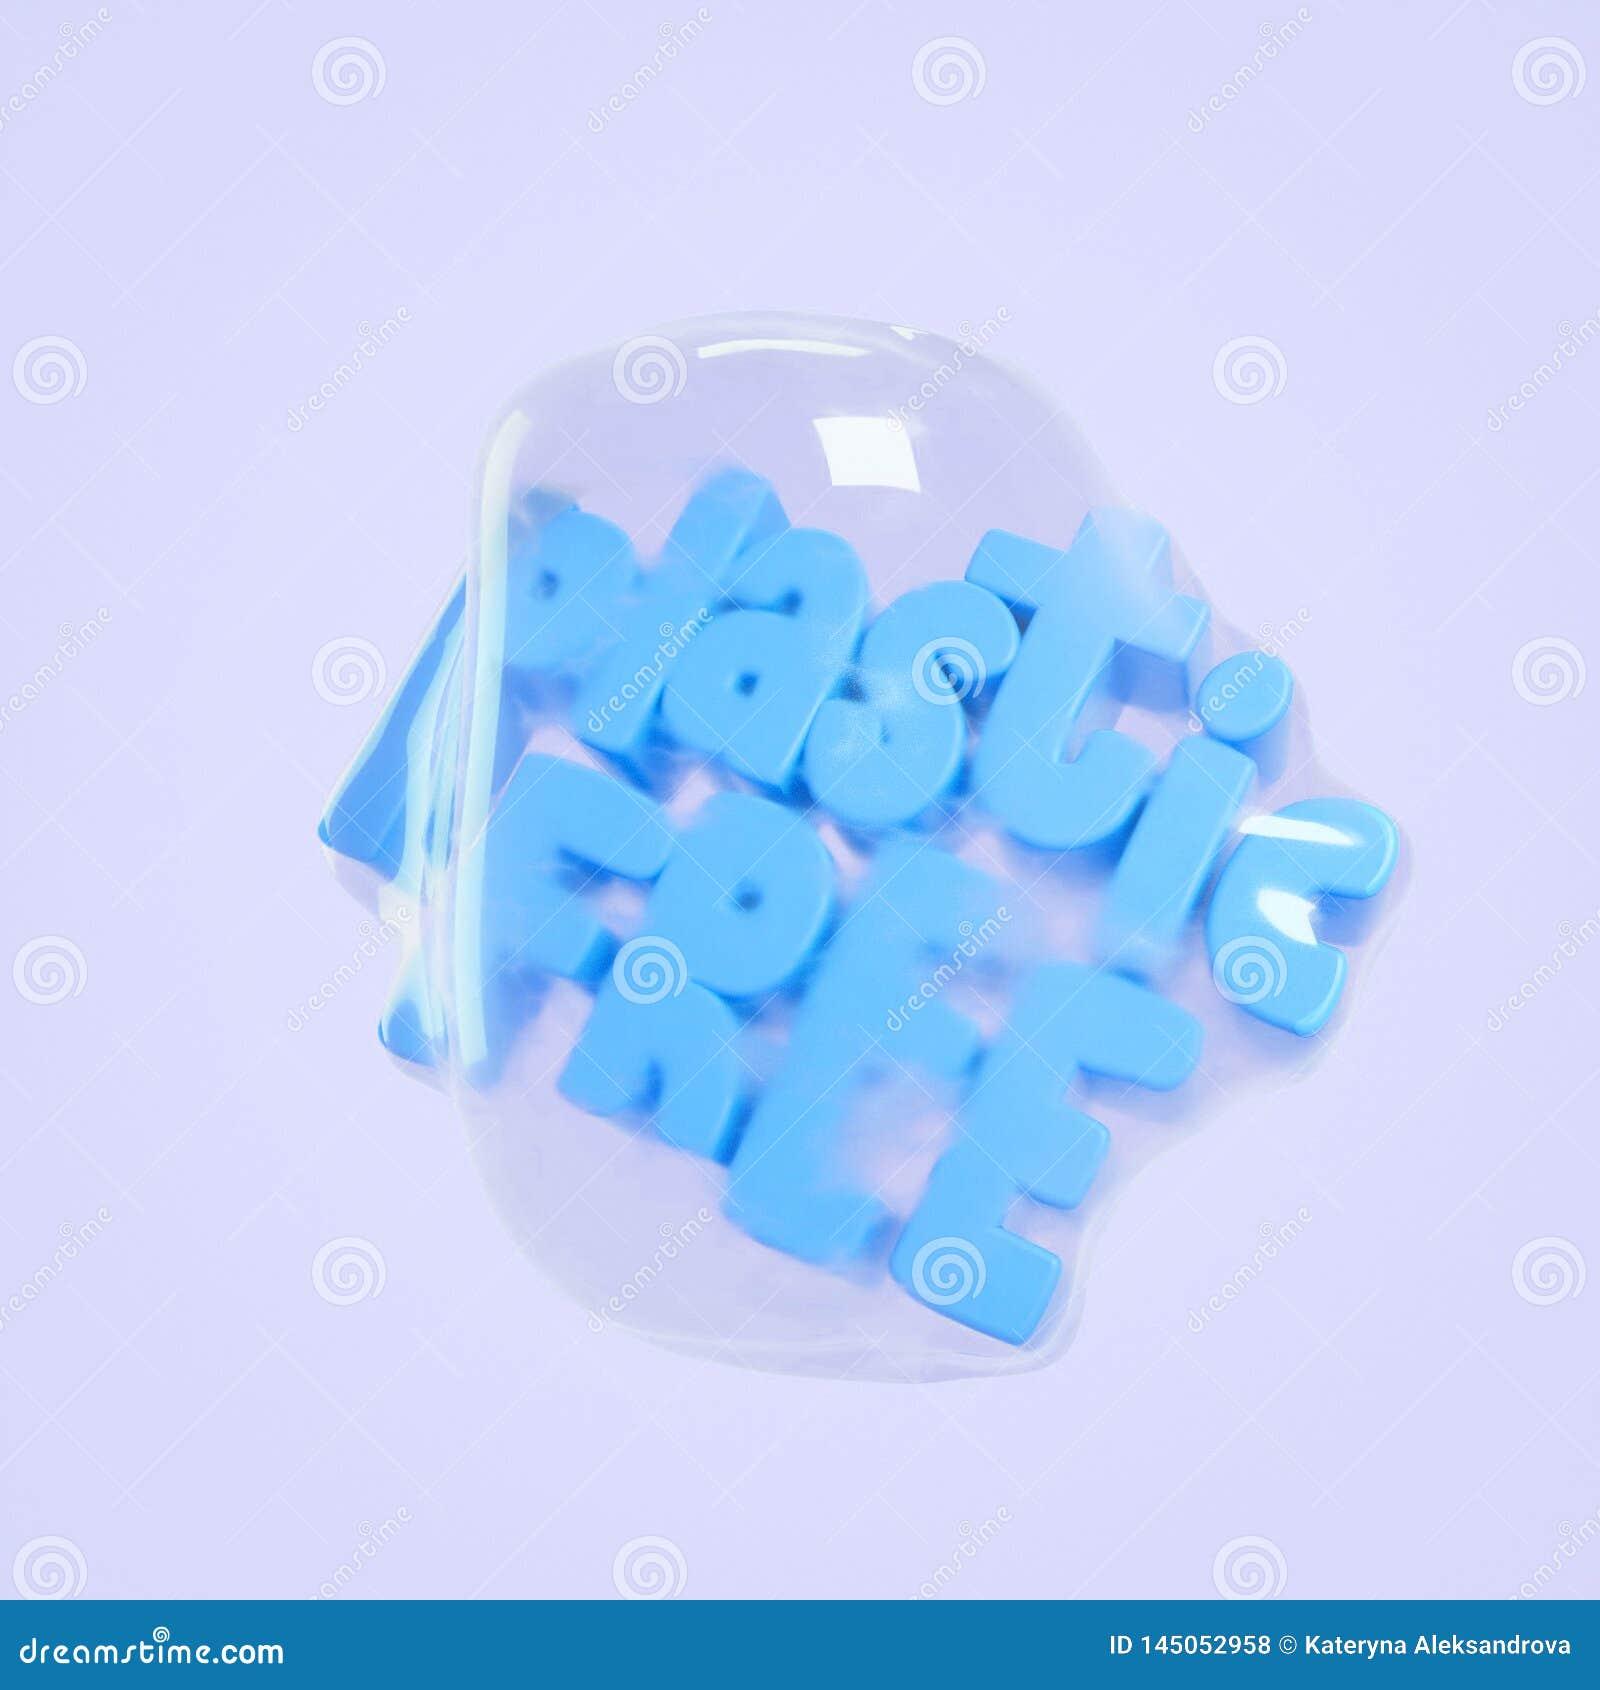 Plastic free 3d illustration rendering lettering. Save planet concept.